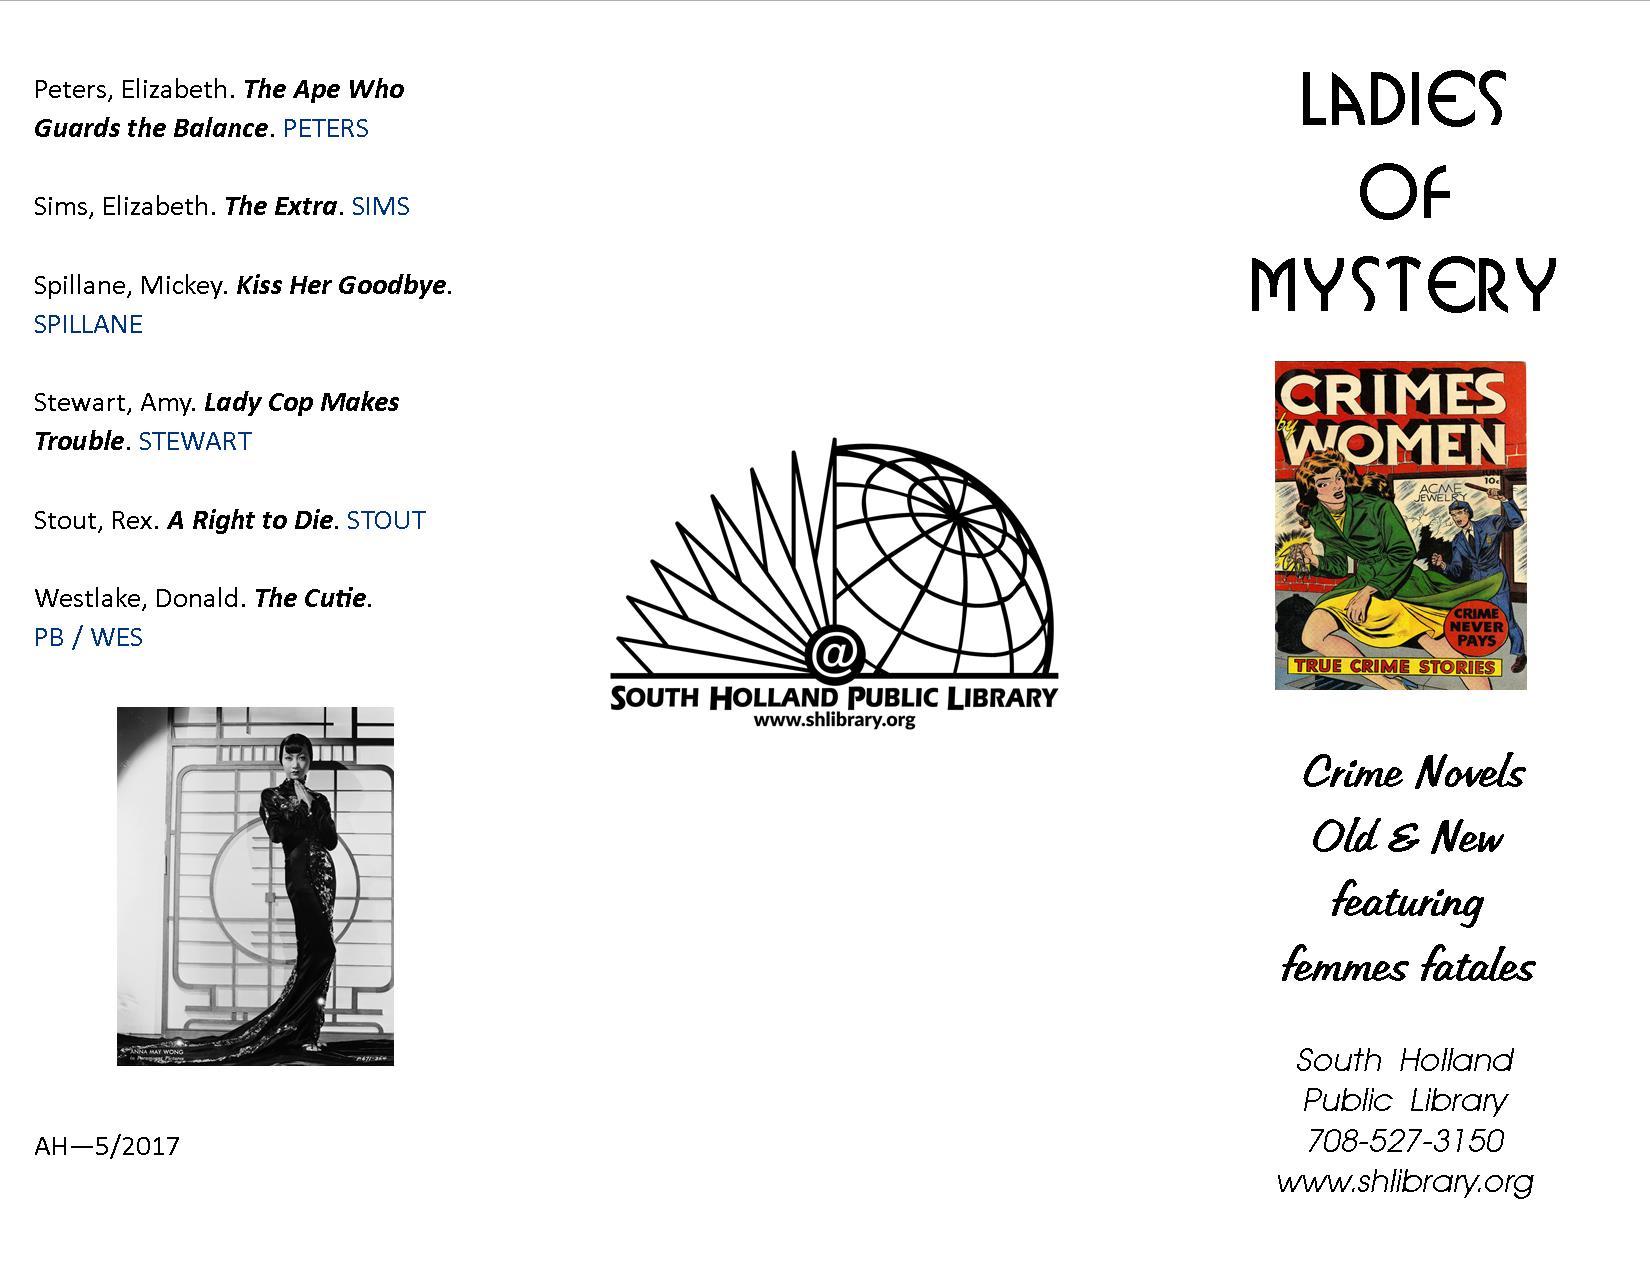 Ladies of mystery 1